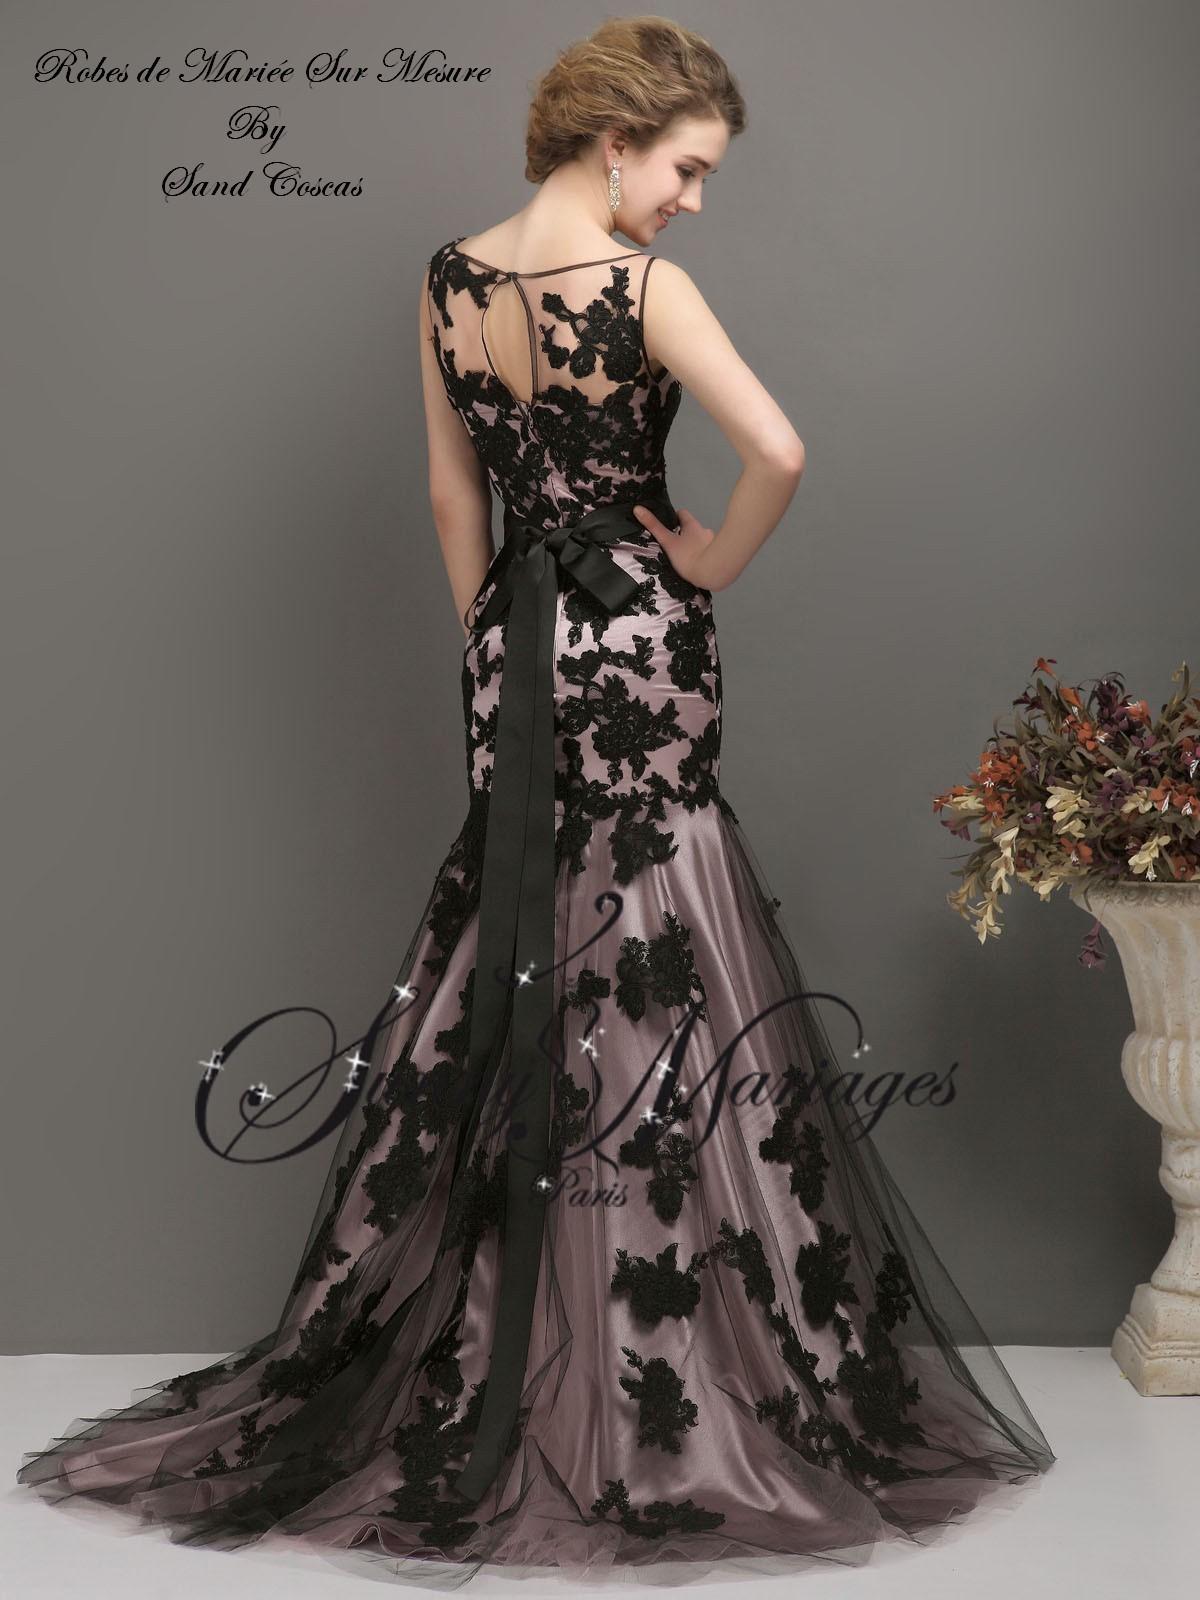 robe de mari u00e9e couleur dentelle noire coupe sirene